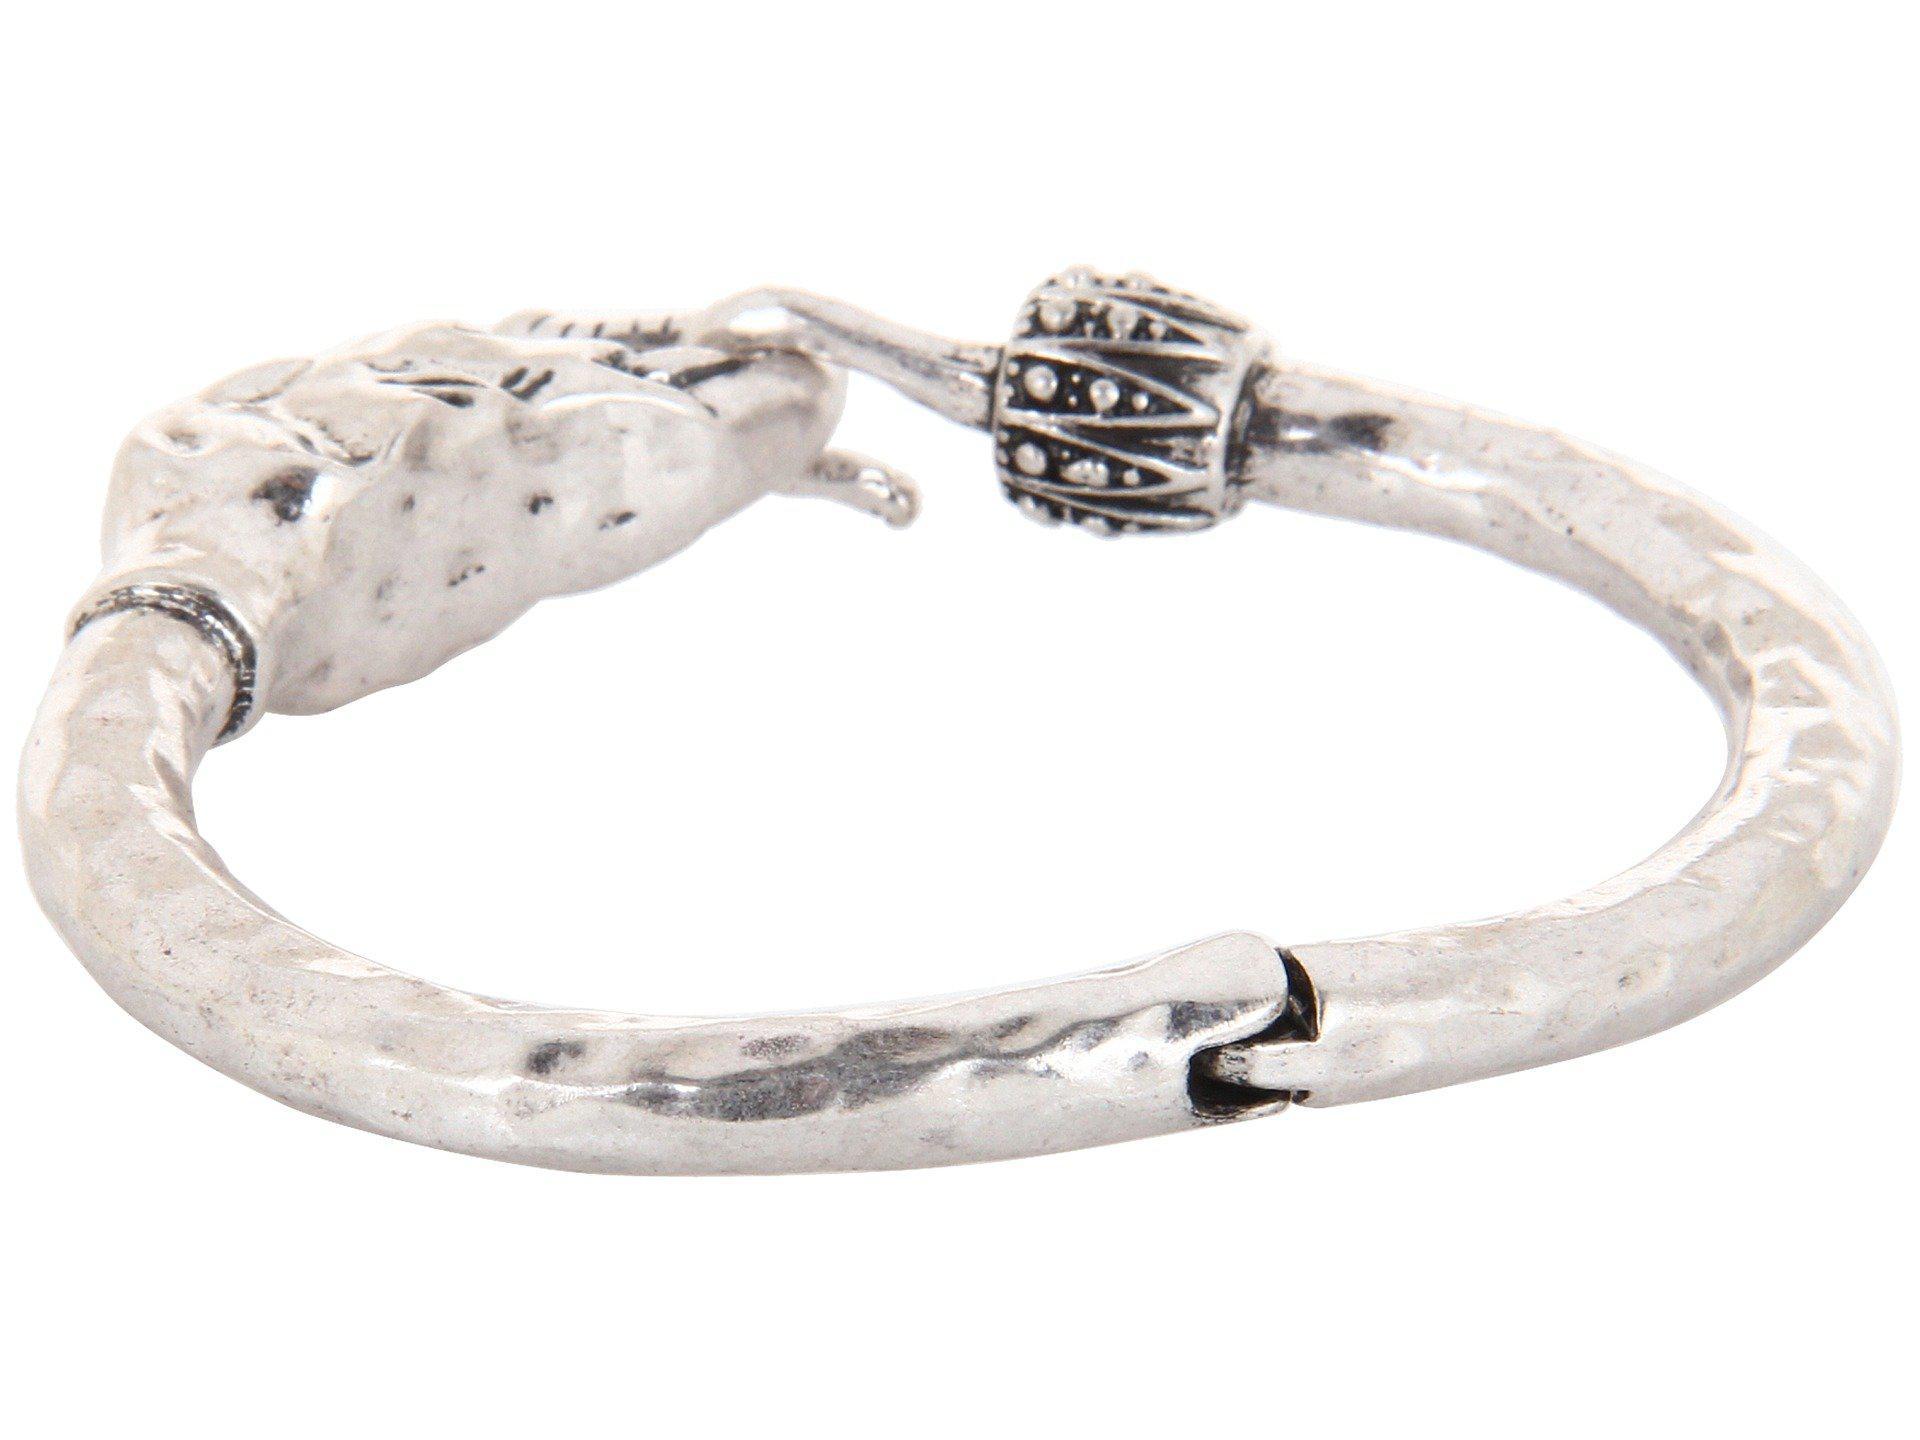 Lucky Brand Bombay Fillagree Elephant Cuff (Silver) Bracelet C8C4uCpF7x